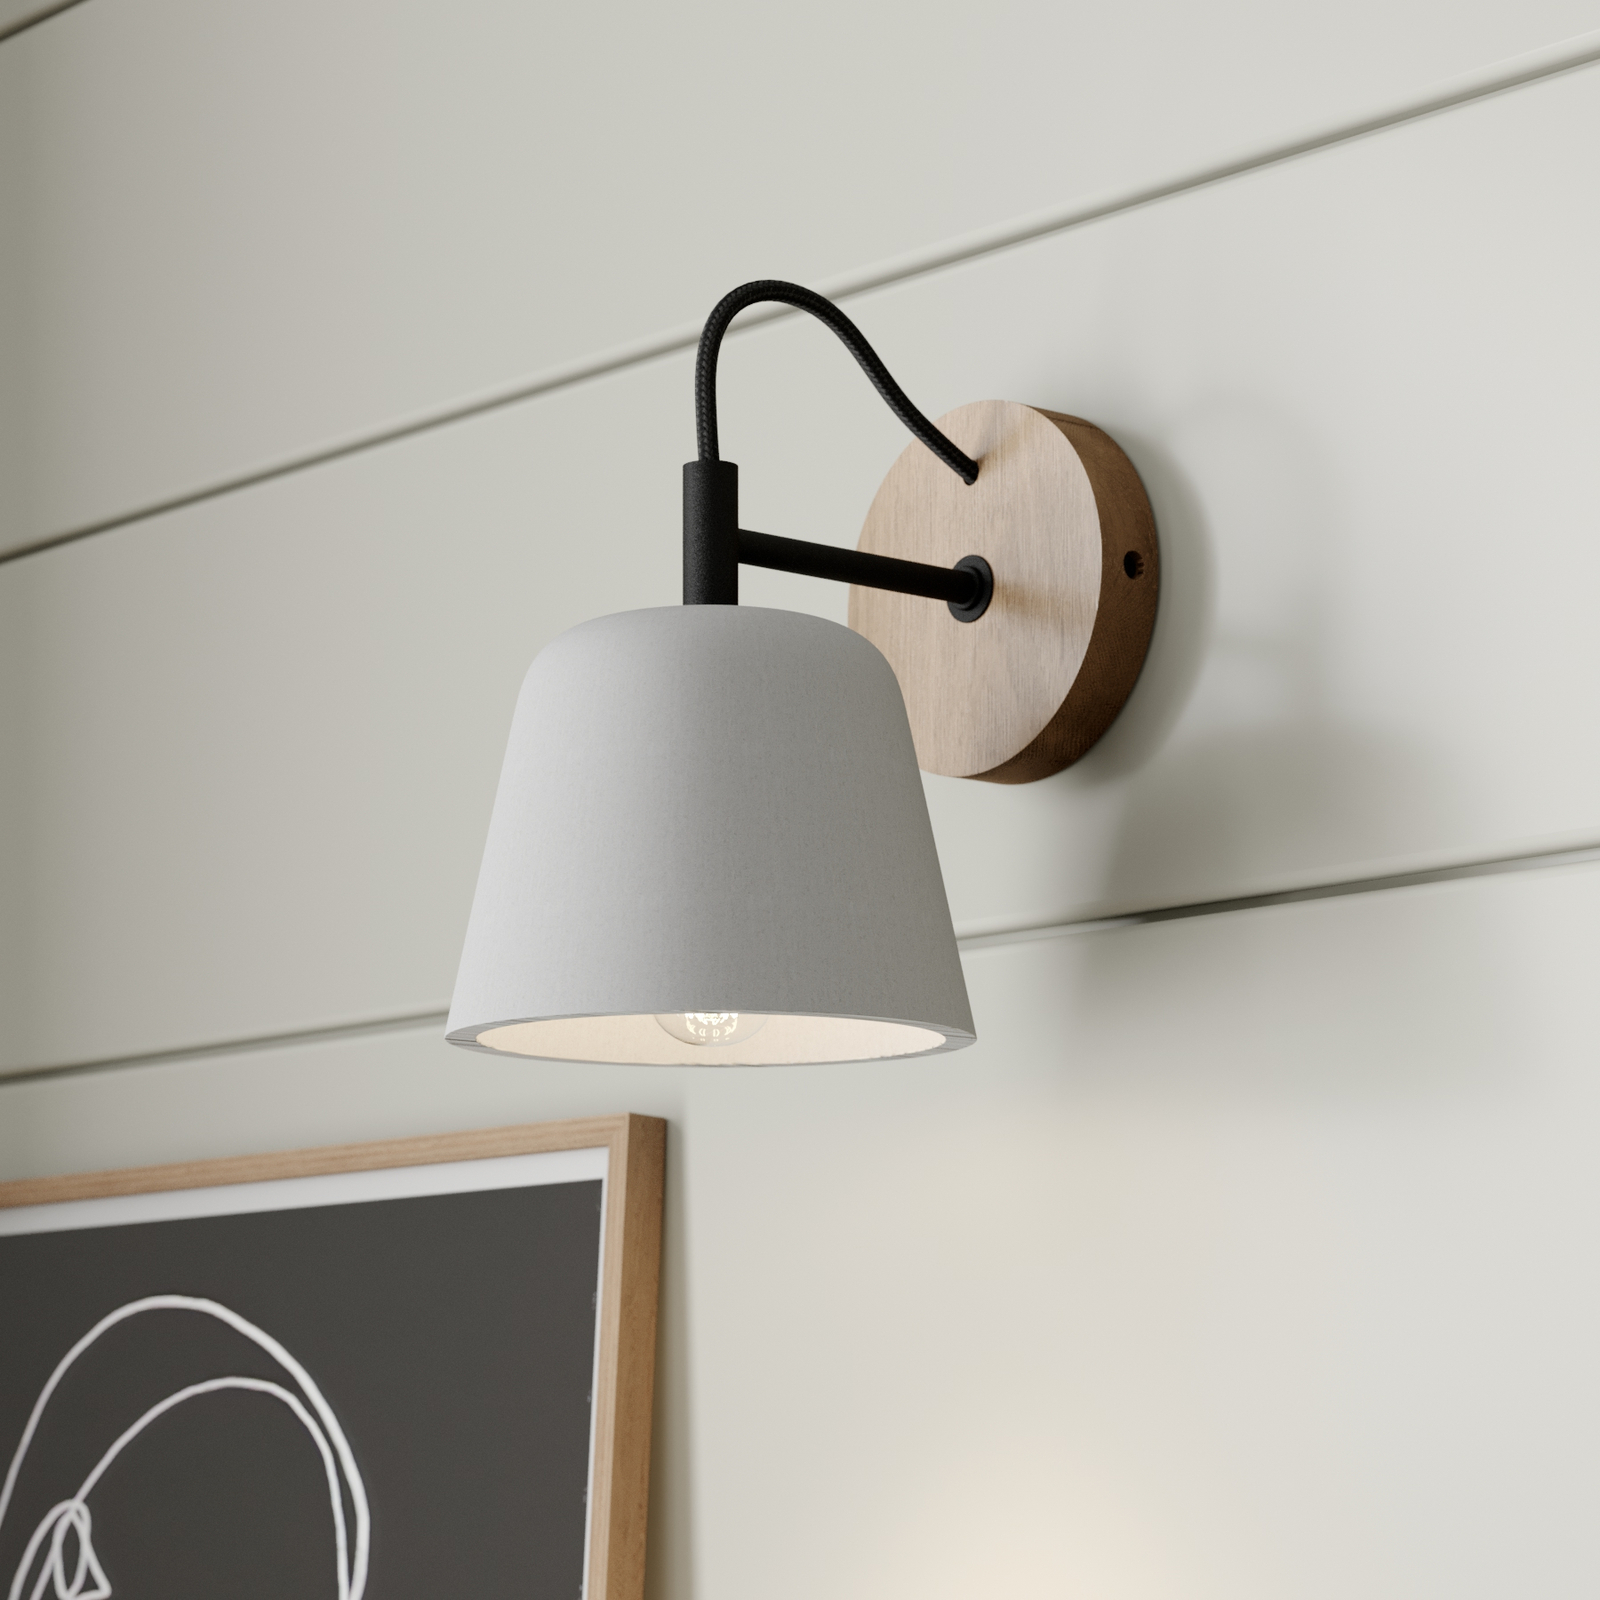 Lucande Kalinda lampa ścienna z betonowym kloszem